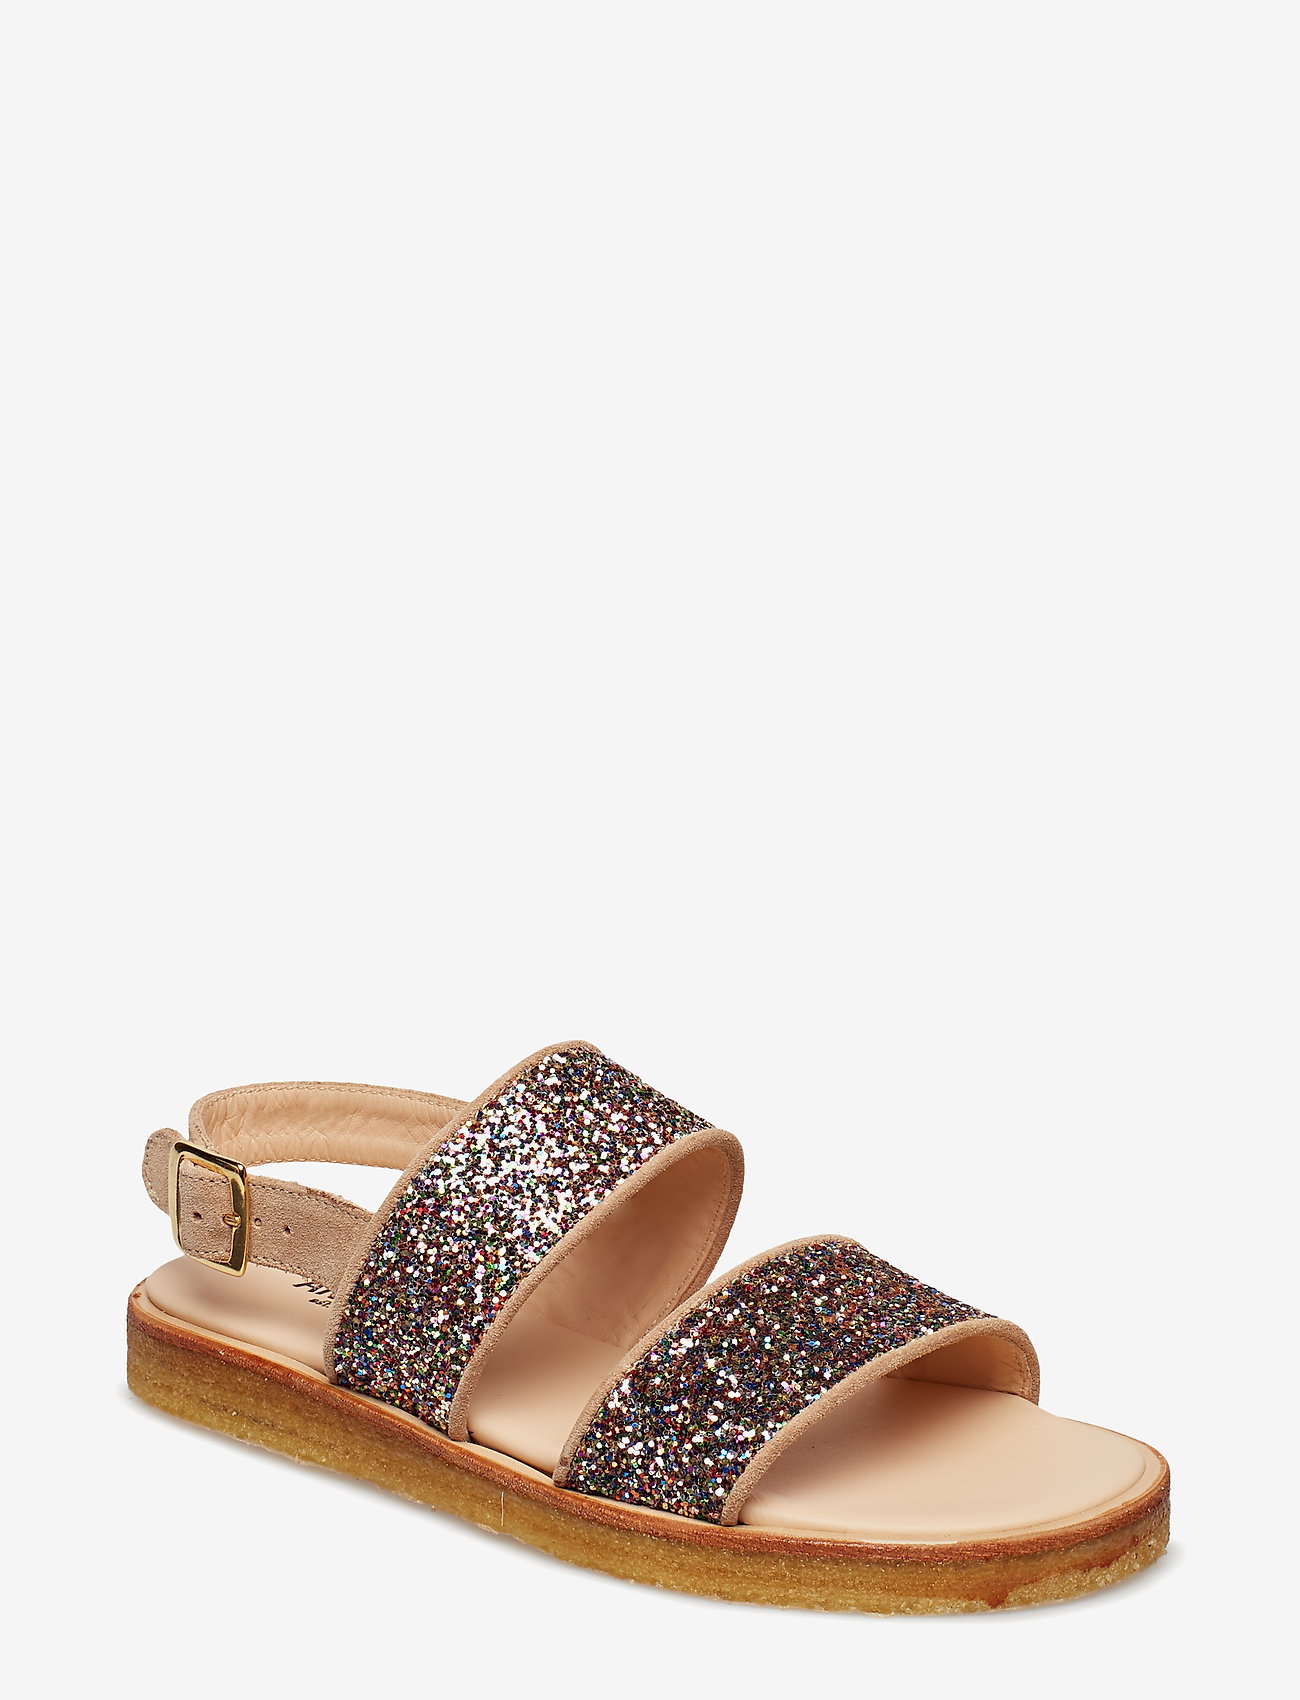 ANGULUS - Sandals - flat - open toe - op - flache sandalen - 1149/2488 sand/multi glitter - 0